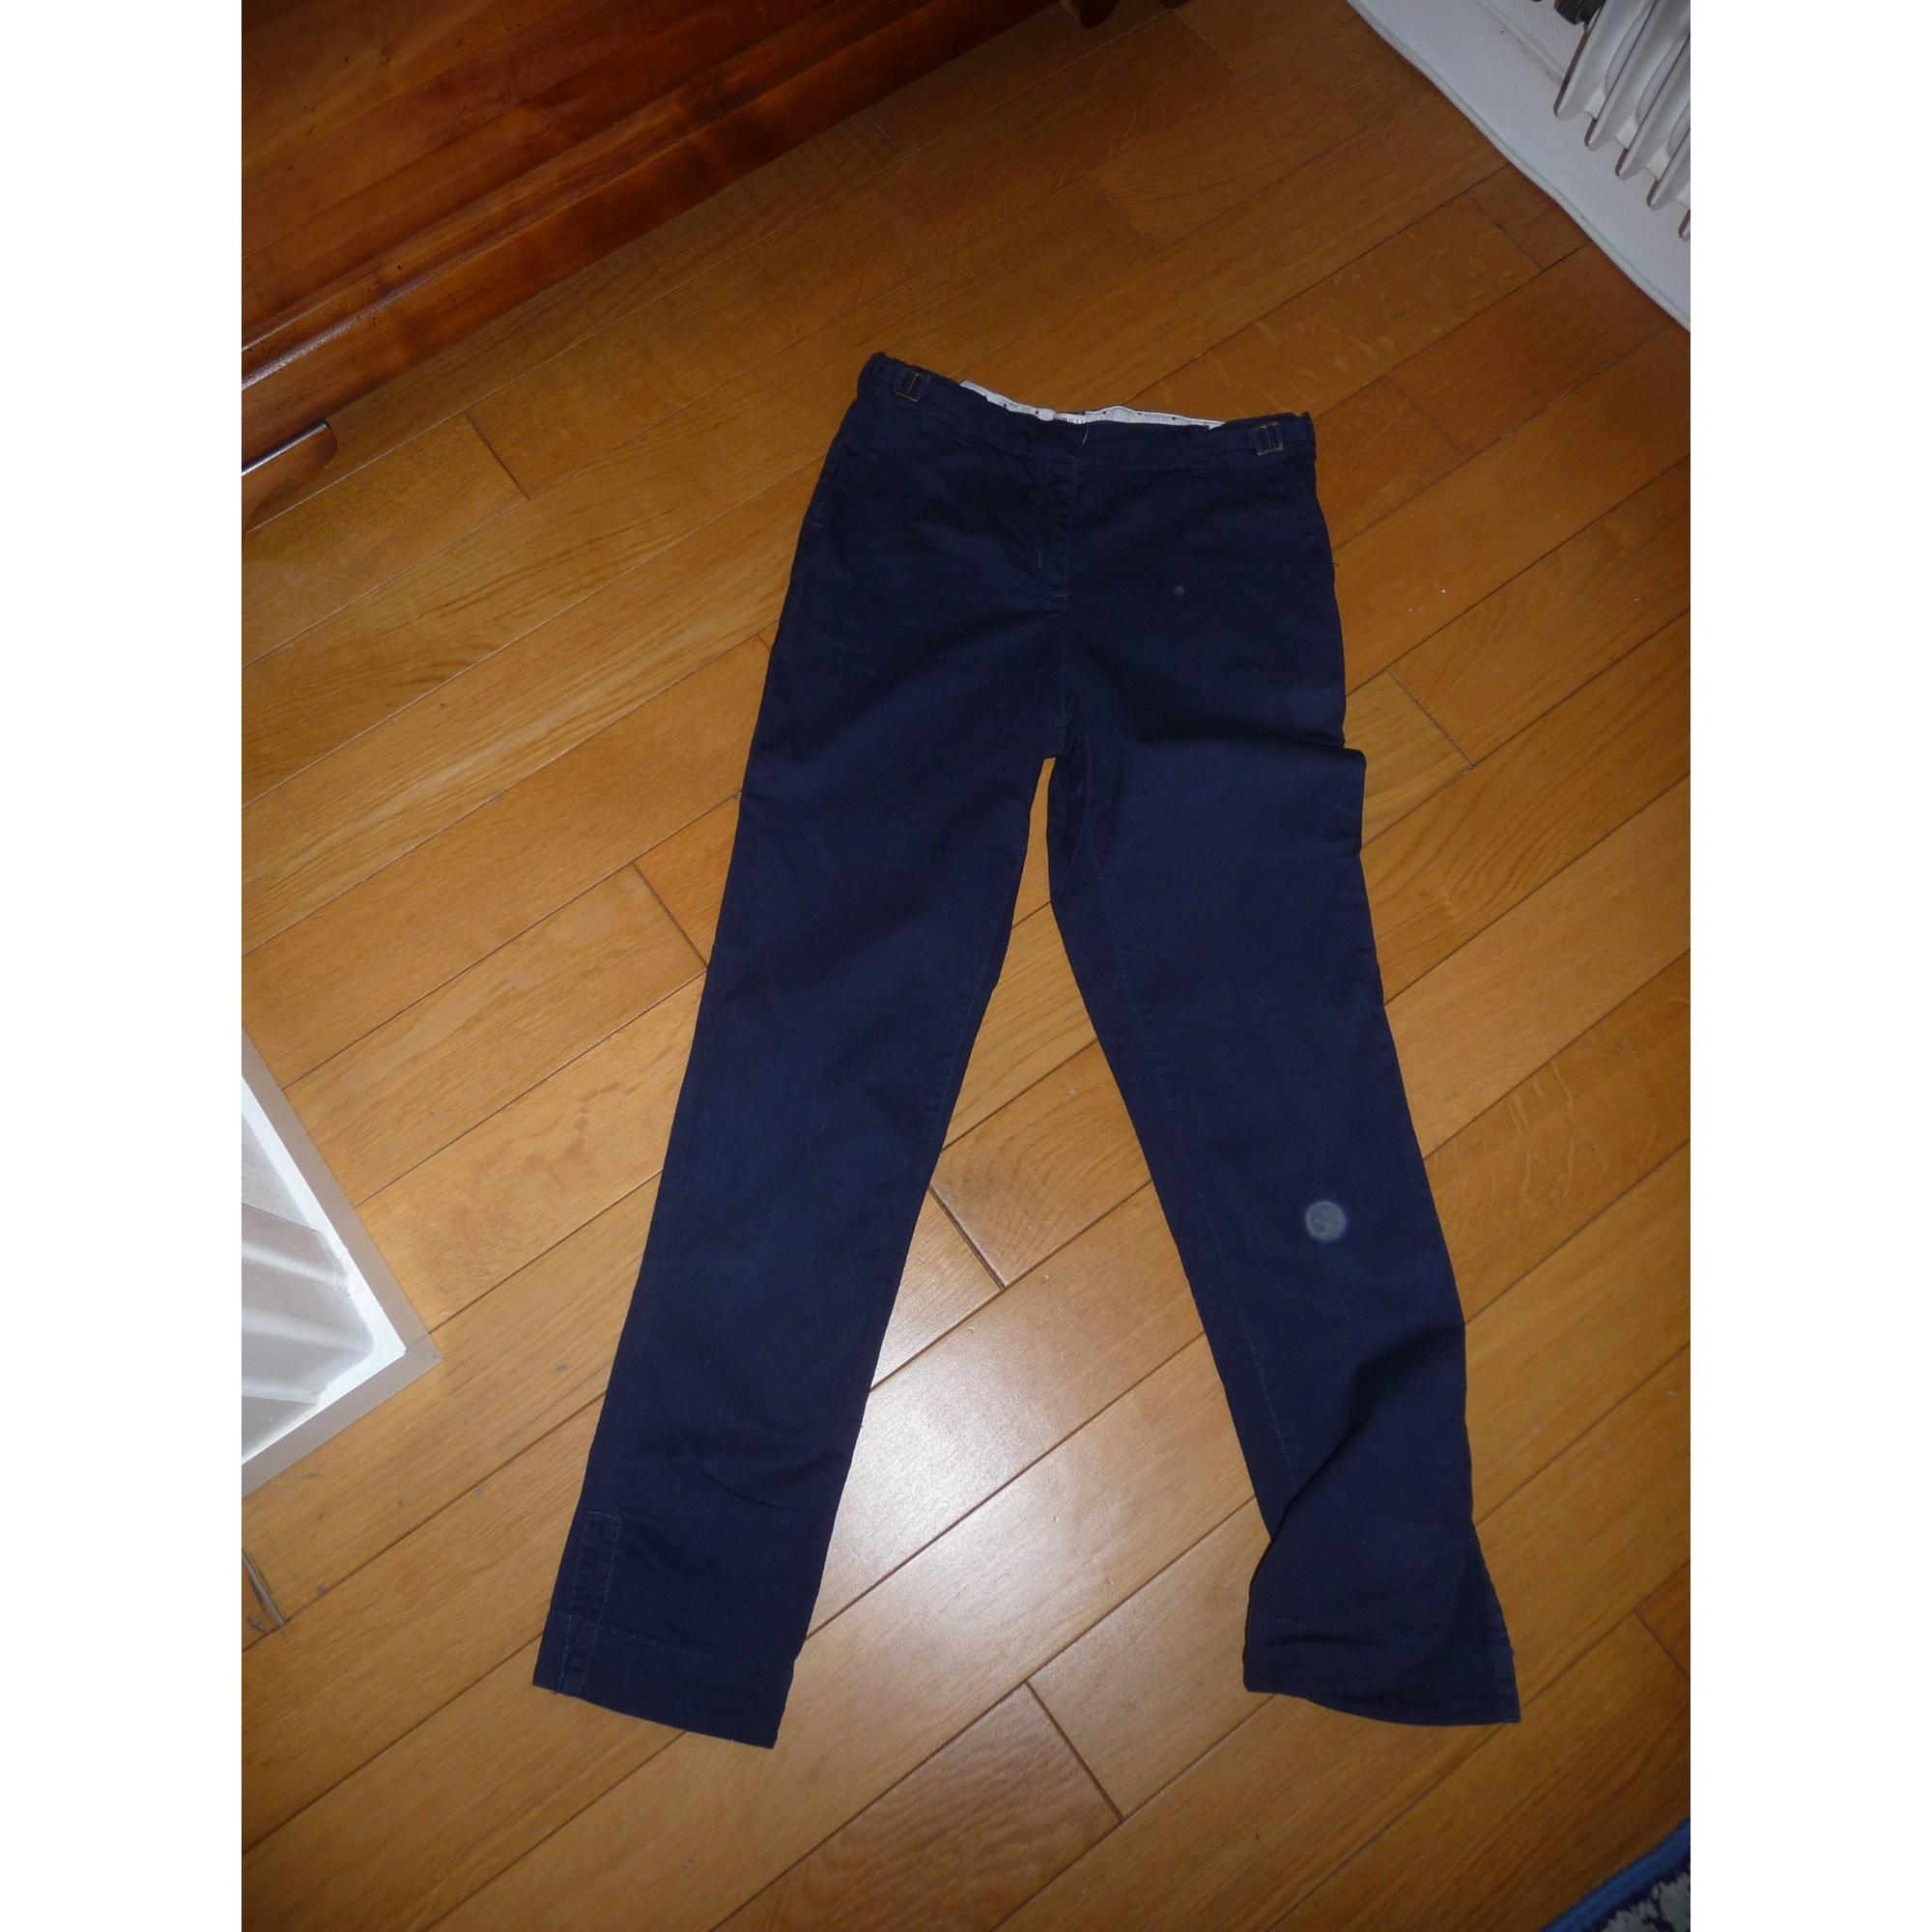 Pantalon CYRILLUS Bleu, bleu marine, bleu turquoise